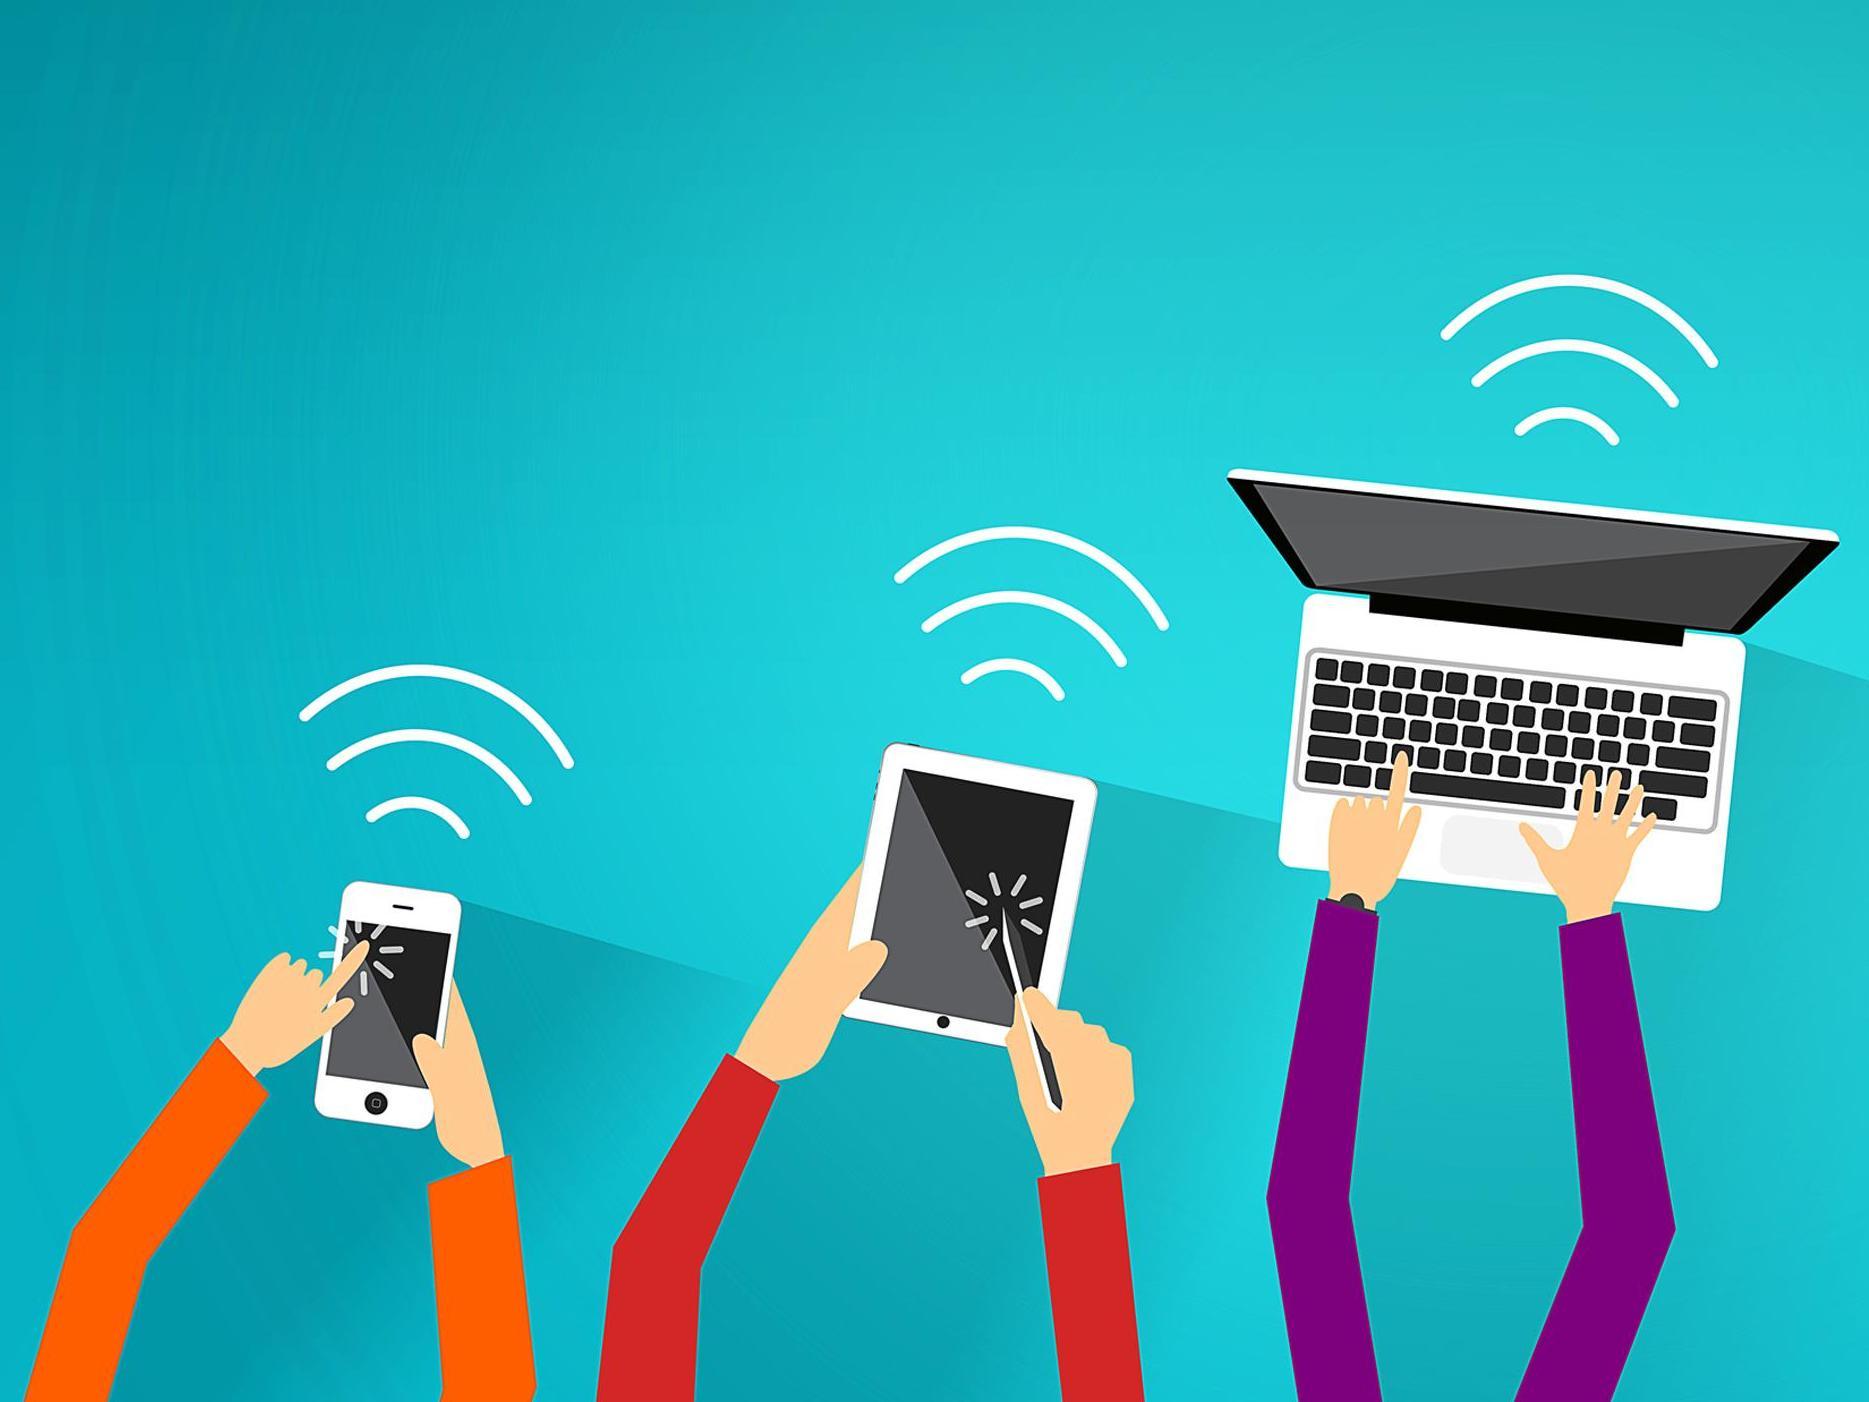 Wi-Fi : use eduroam, end of secure-unil